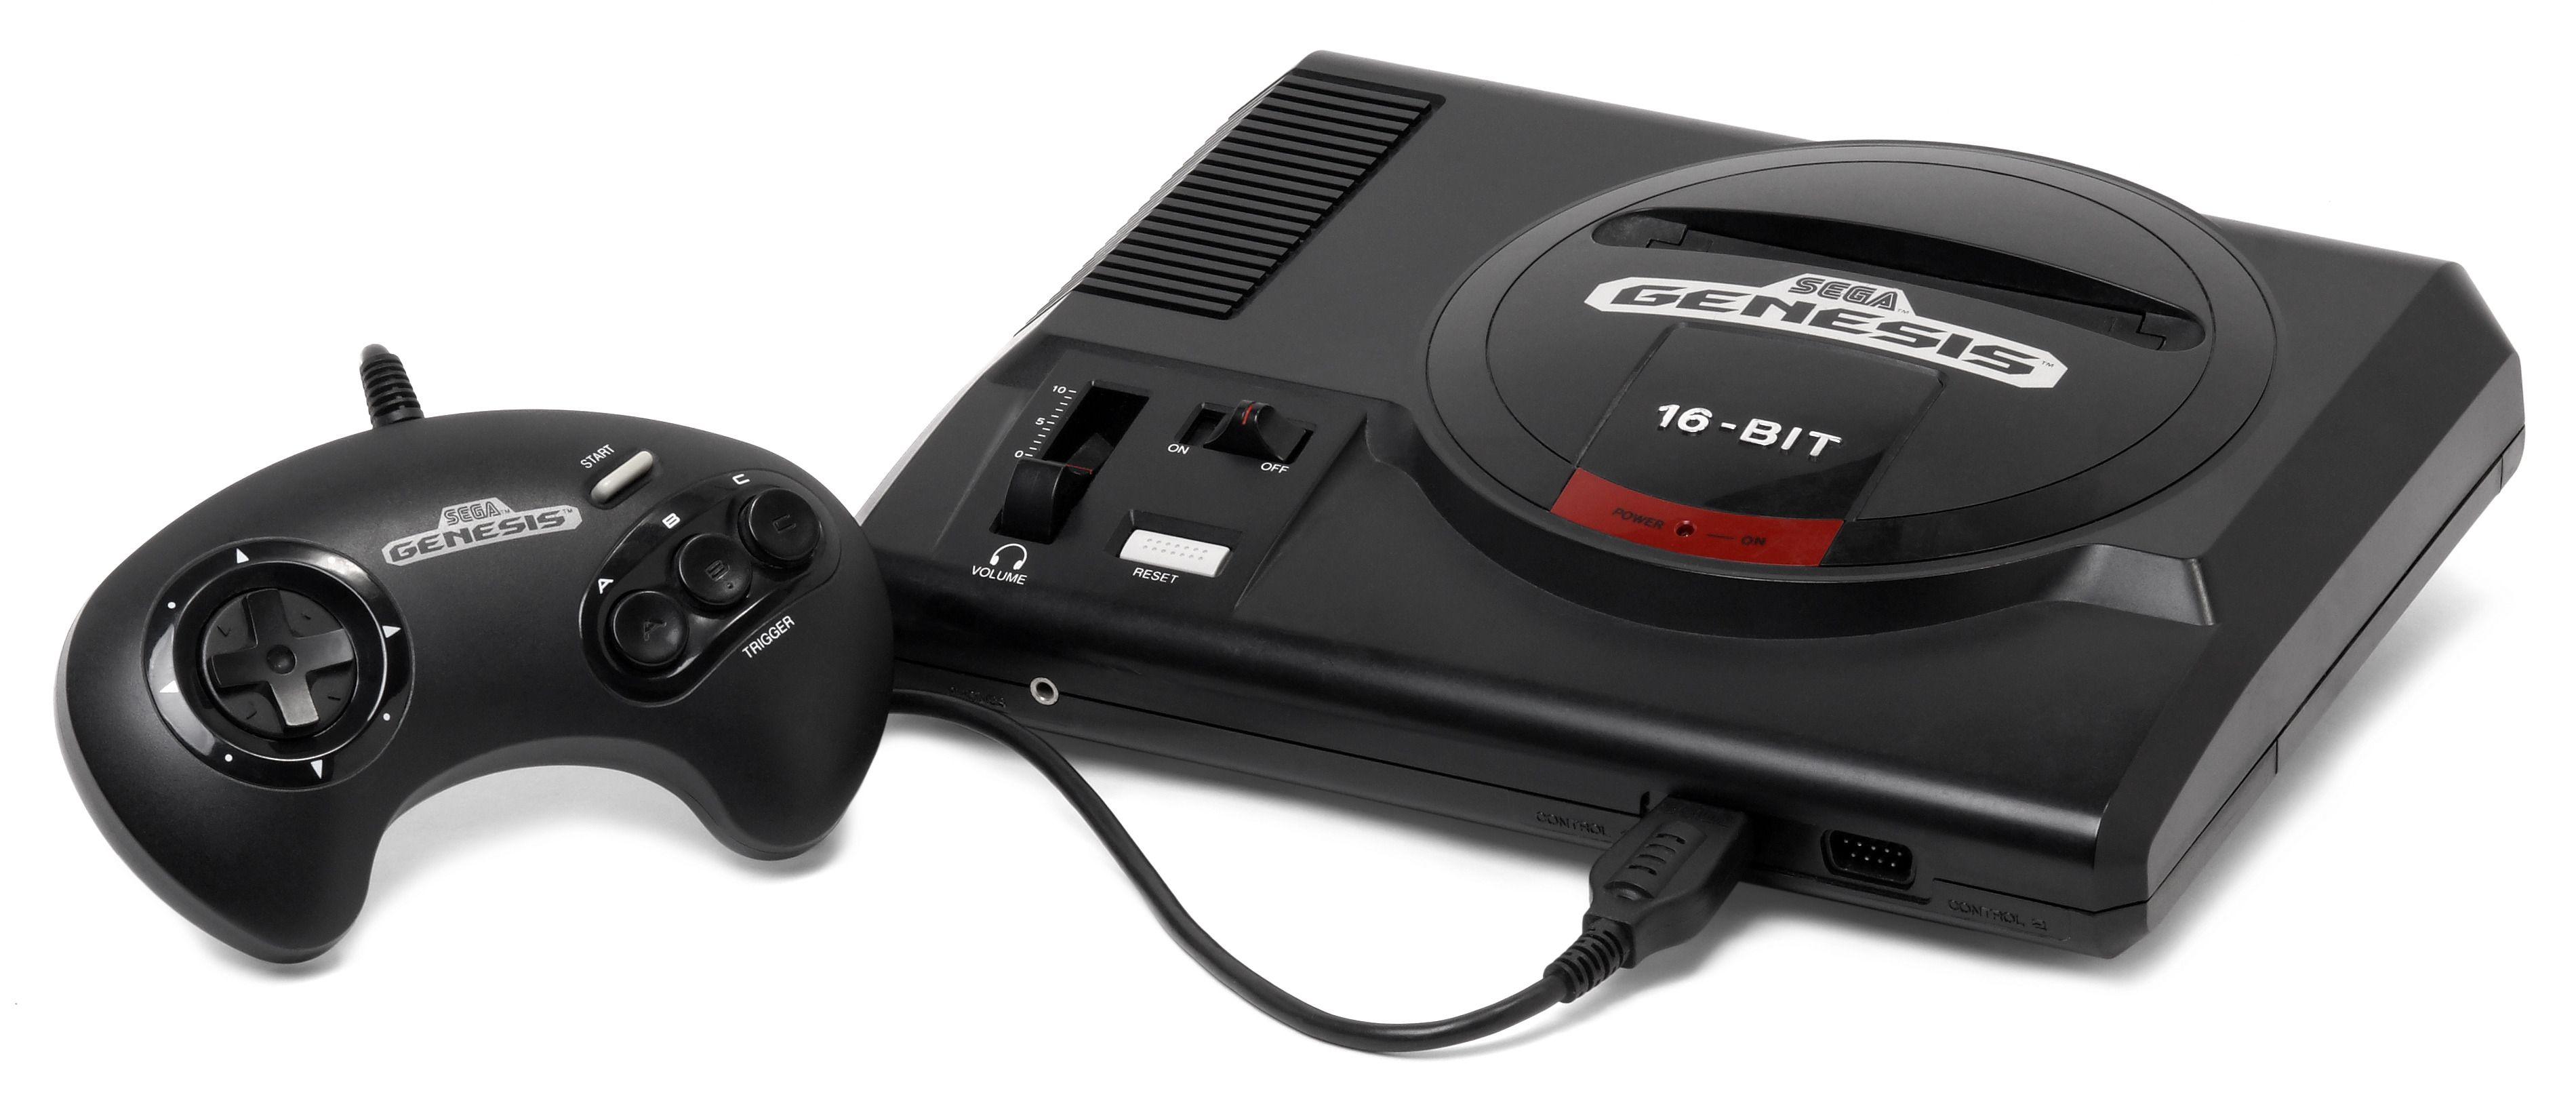 Sega Mega Drive i amerikansk utgave. Foto: Vanamo Online Game Museum